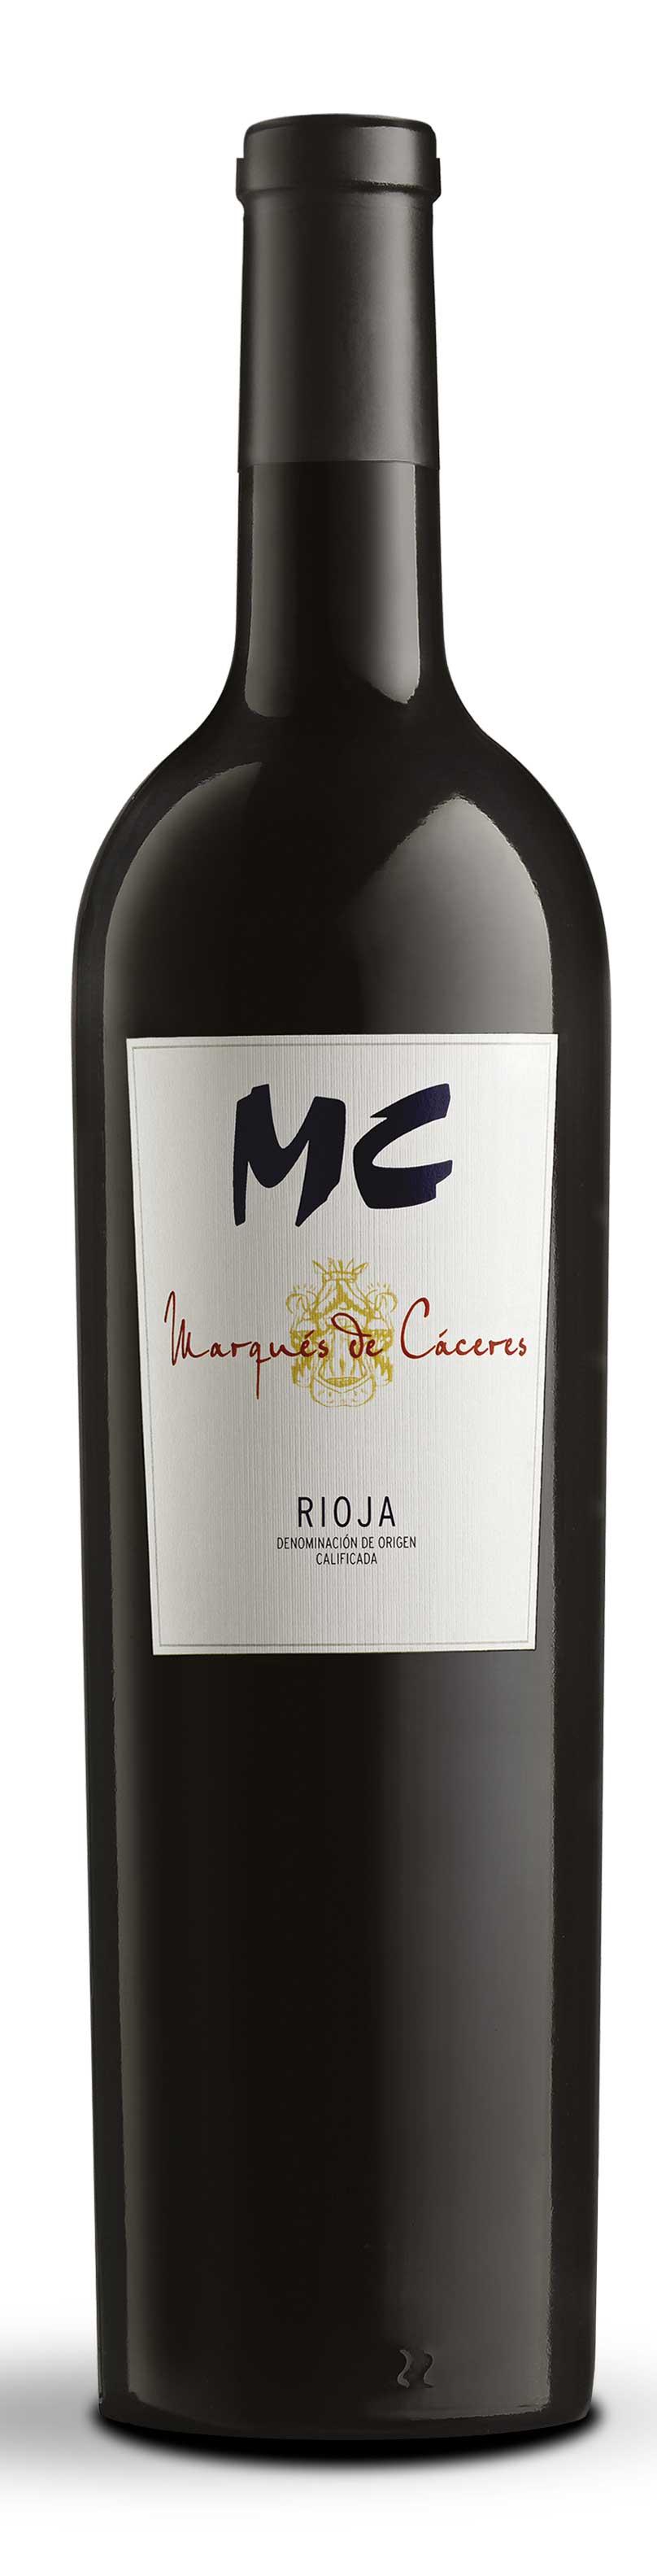 MC ( Bodegas Marqués de Cáceres ) 2002